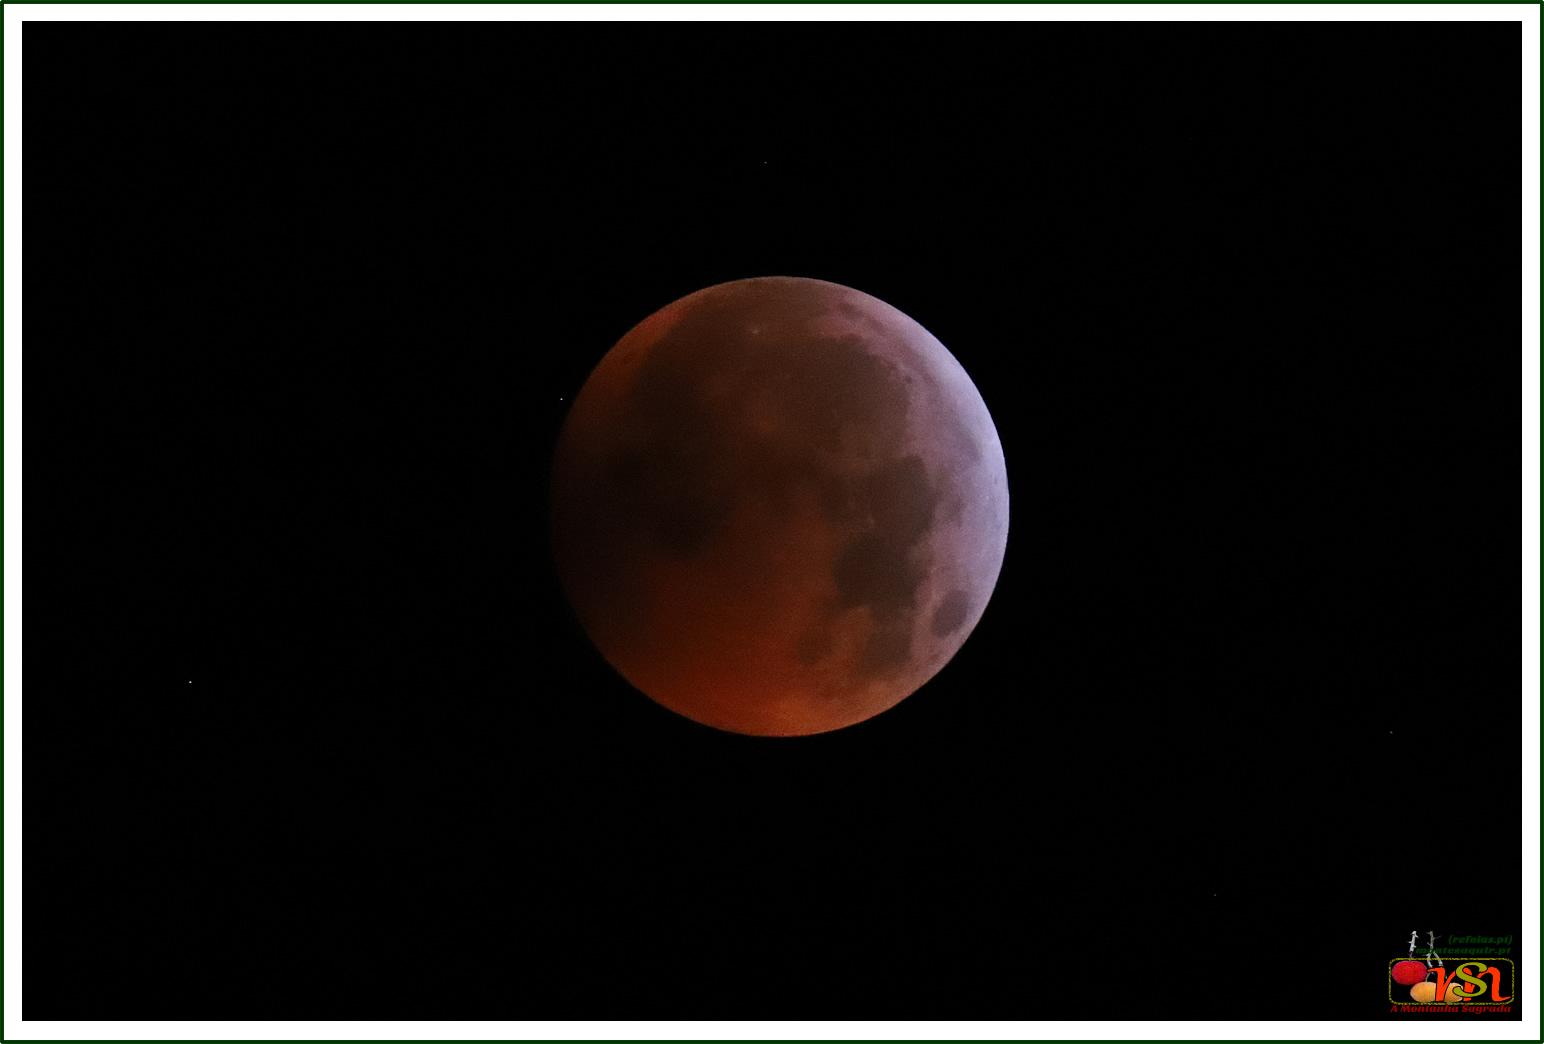 Eclipse Total e Super-Lua-de-Sangue-de-Lobo - 21-01-2019